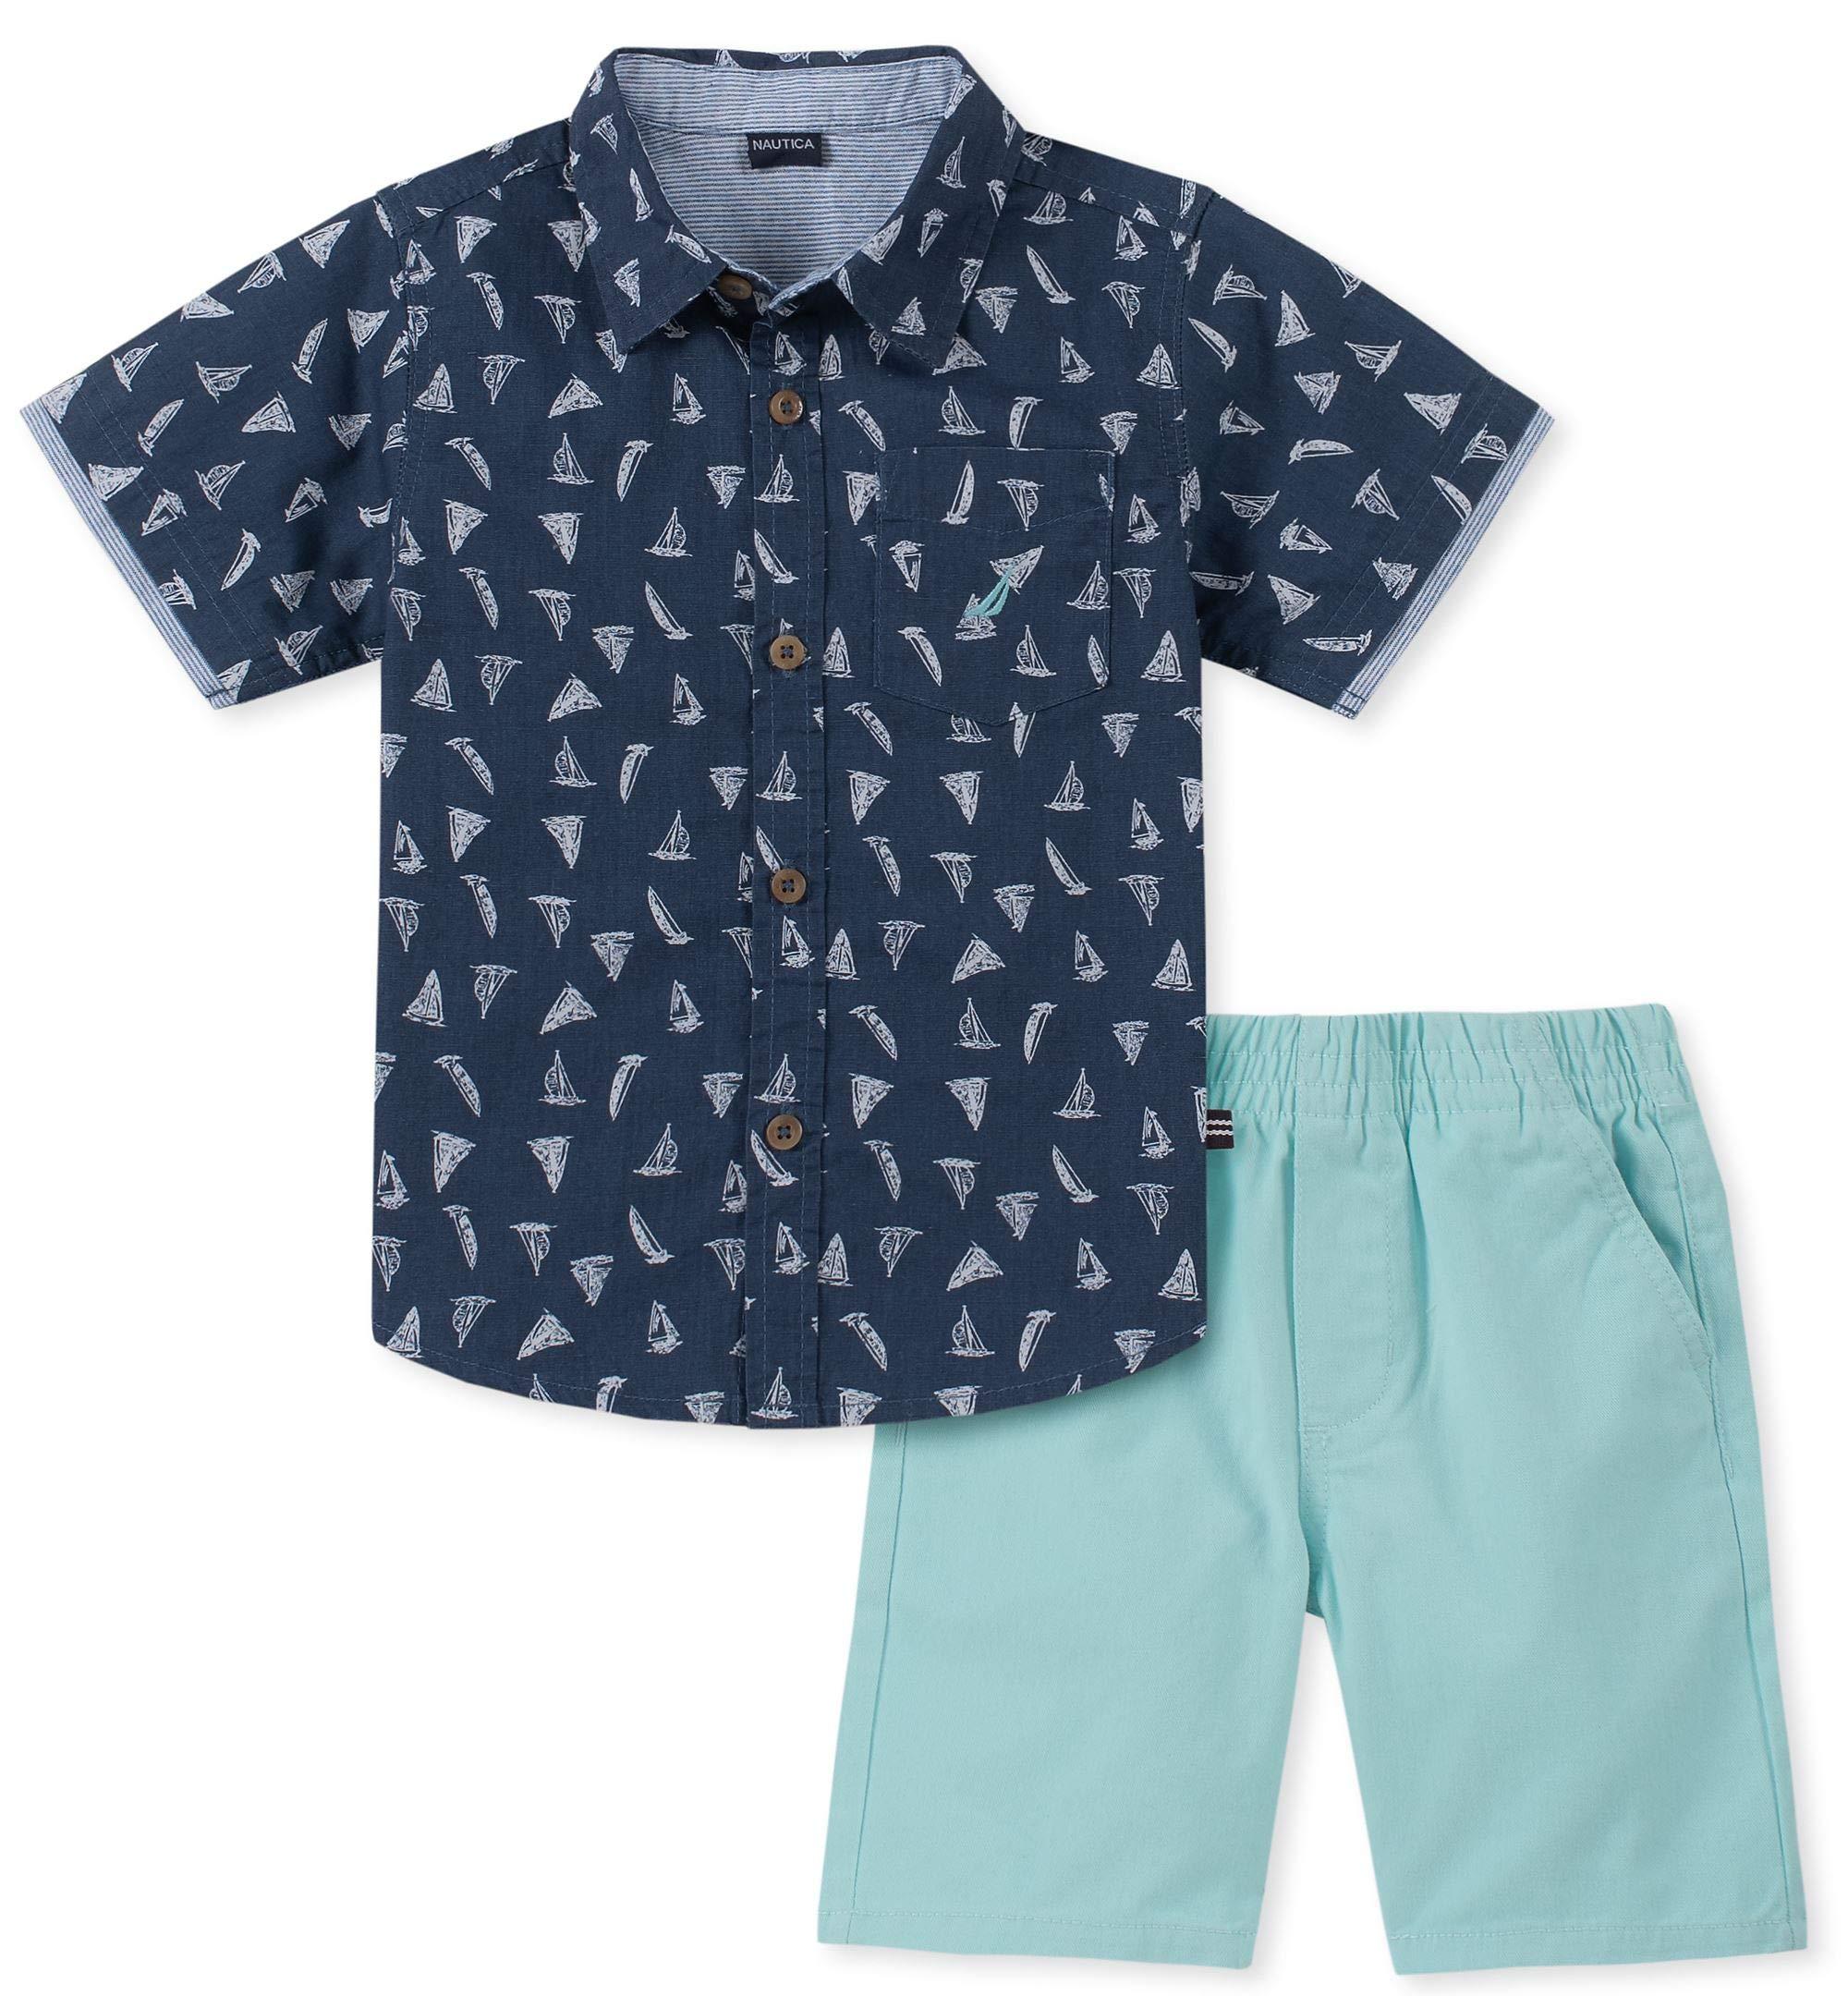 Nautica Sets (KHQ) Boys' Toddler 2 Pieces Shirt Shorts Set, Navy Print 2T